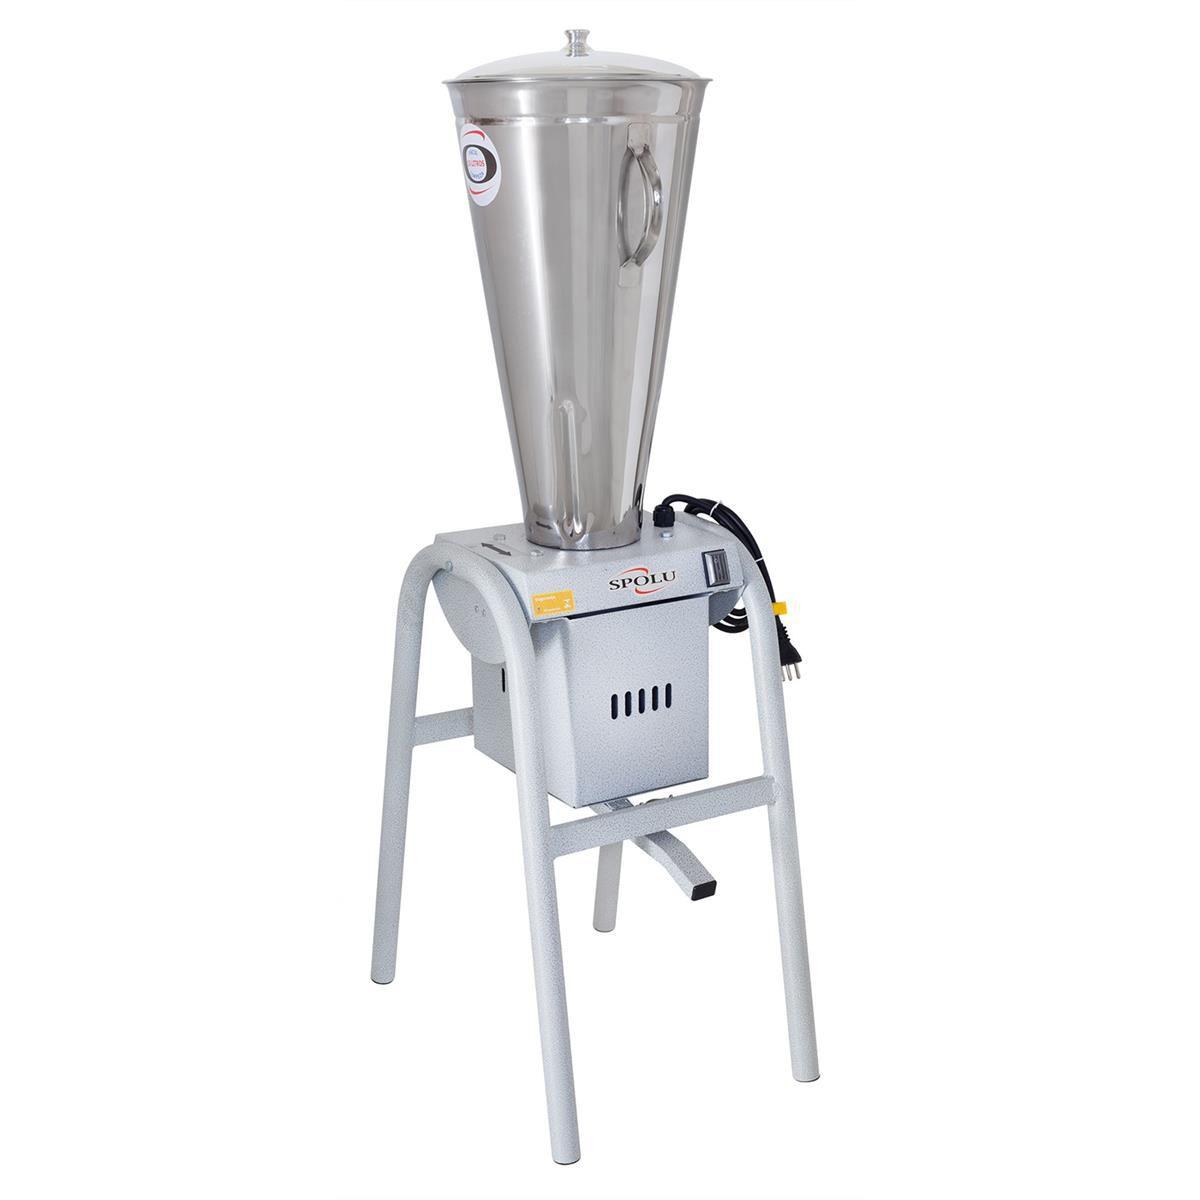 Liquidificador Industrial Spolu SPL-066 15 Litros Inox 220V